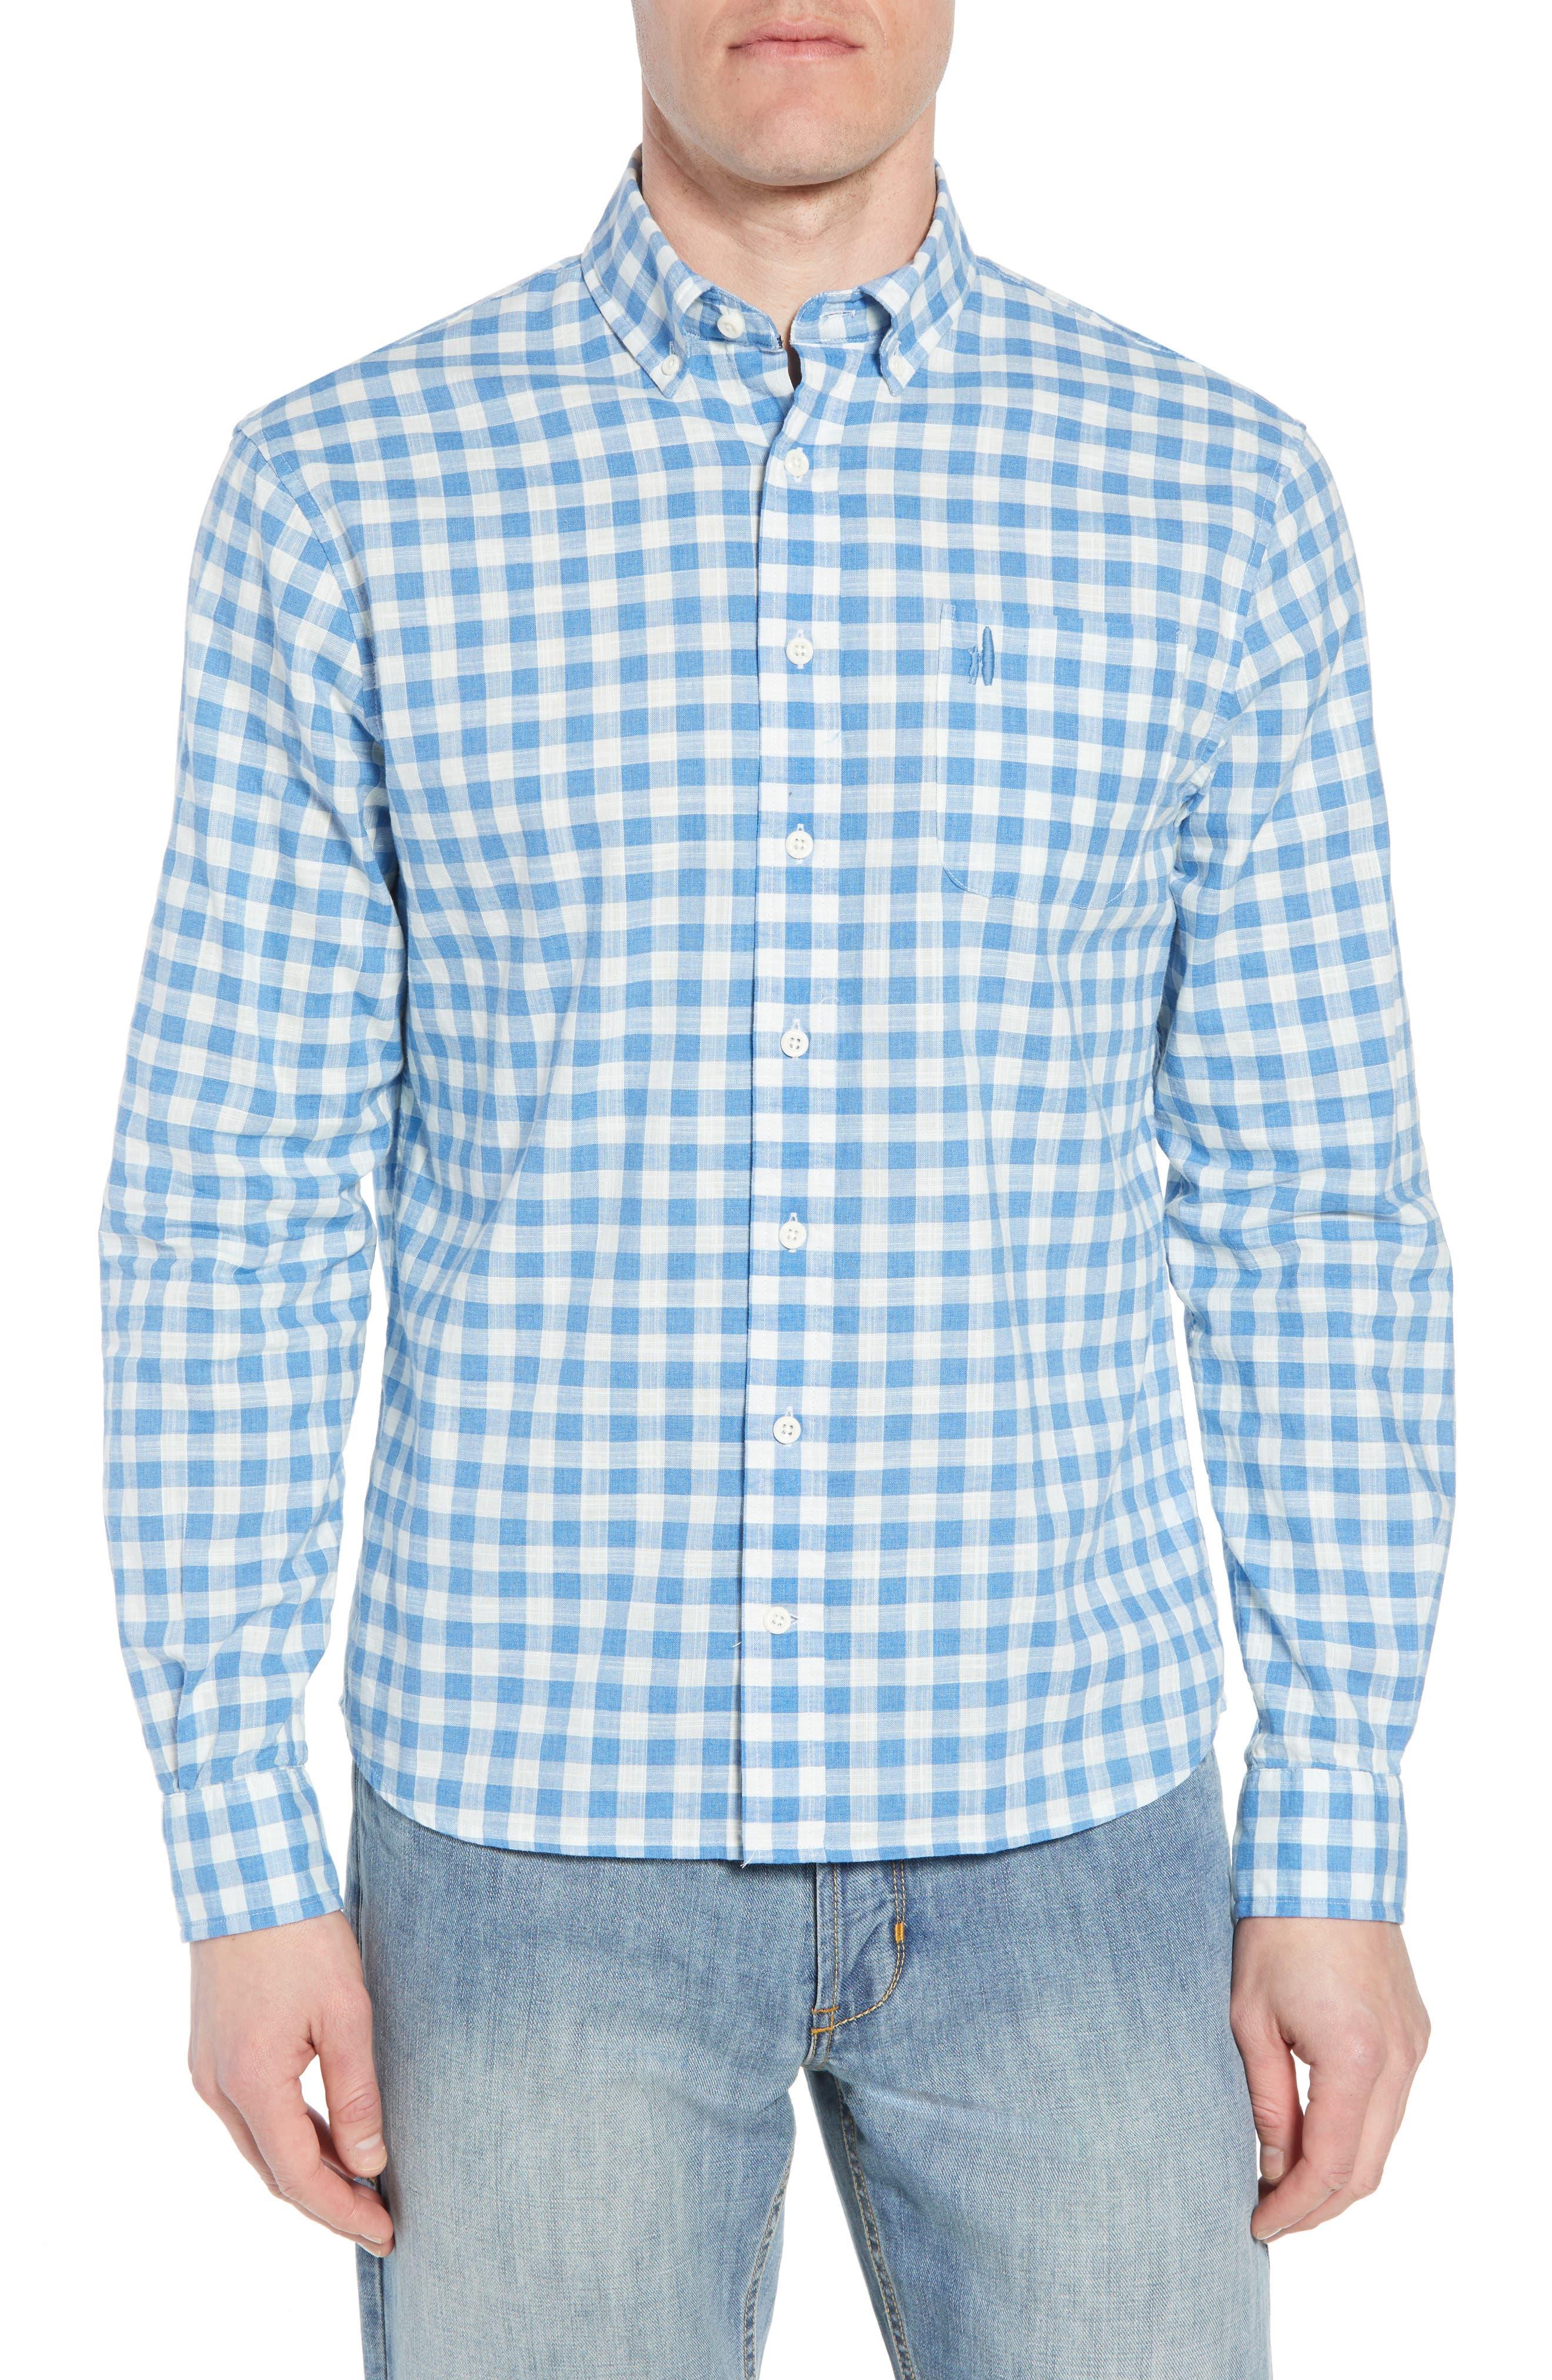 Watts Regular Fit Sport Shirt,                             Main thumbnail 1, color,                             200